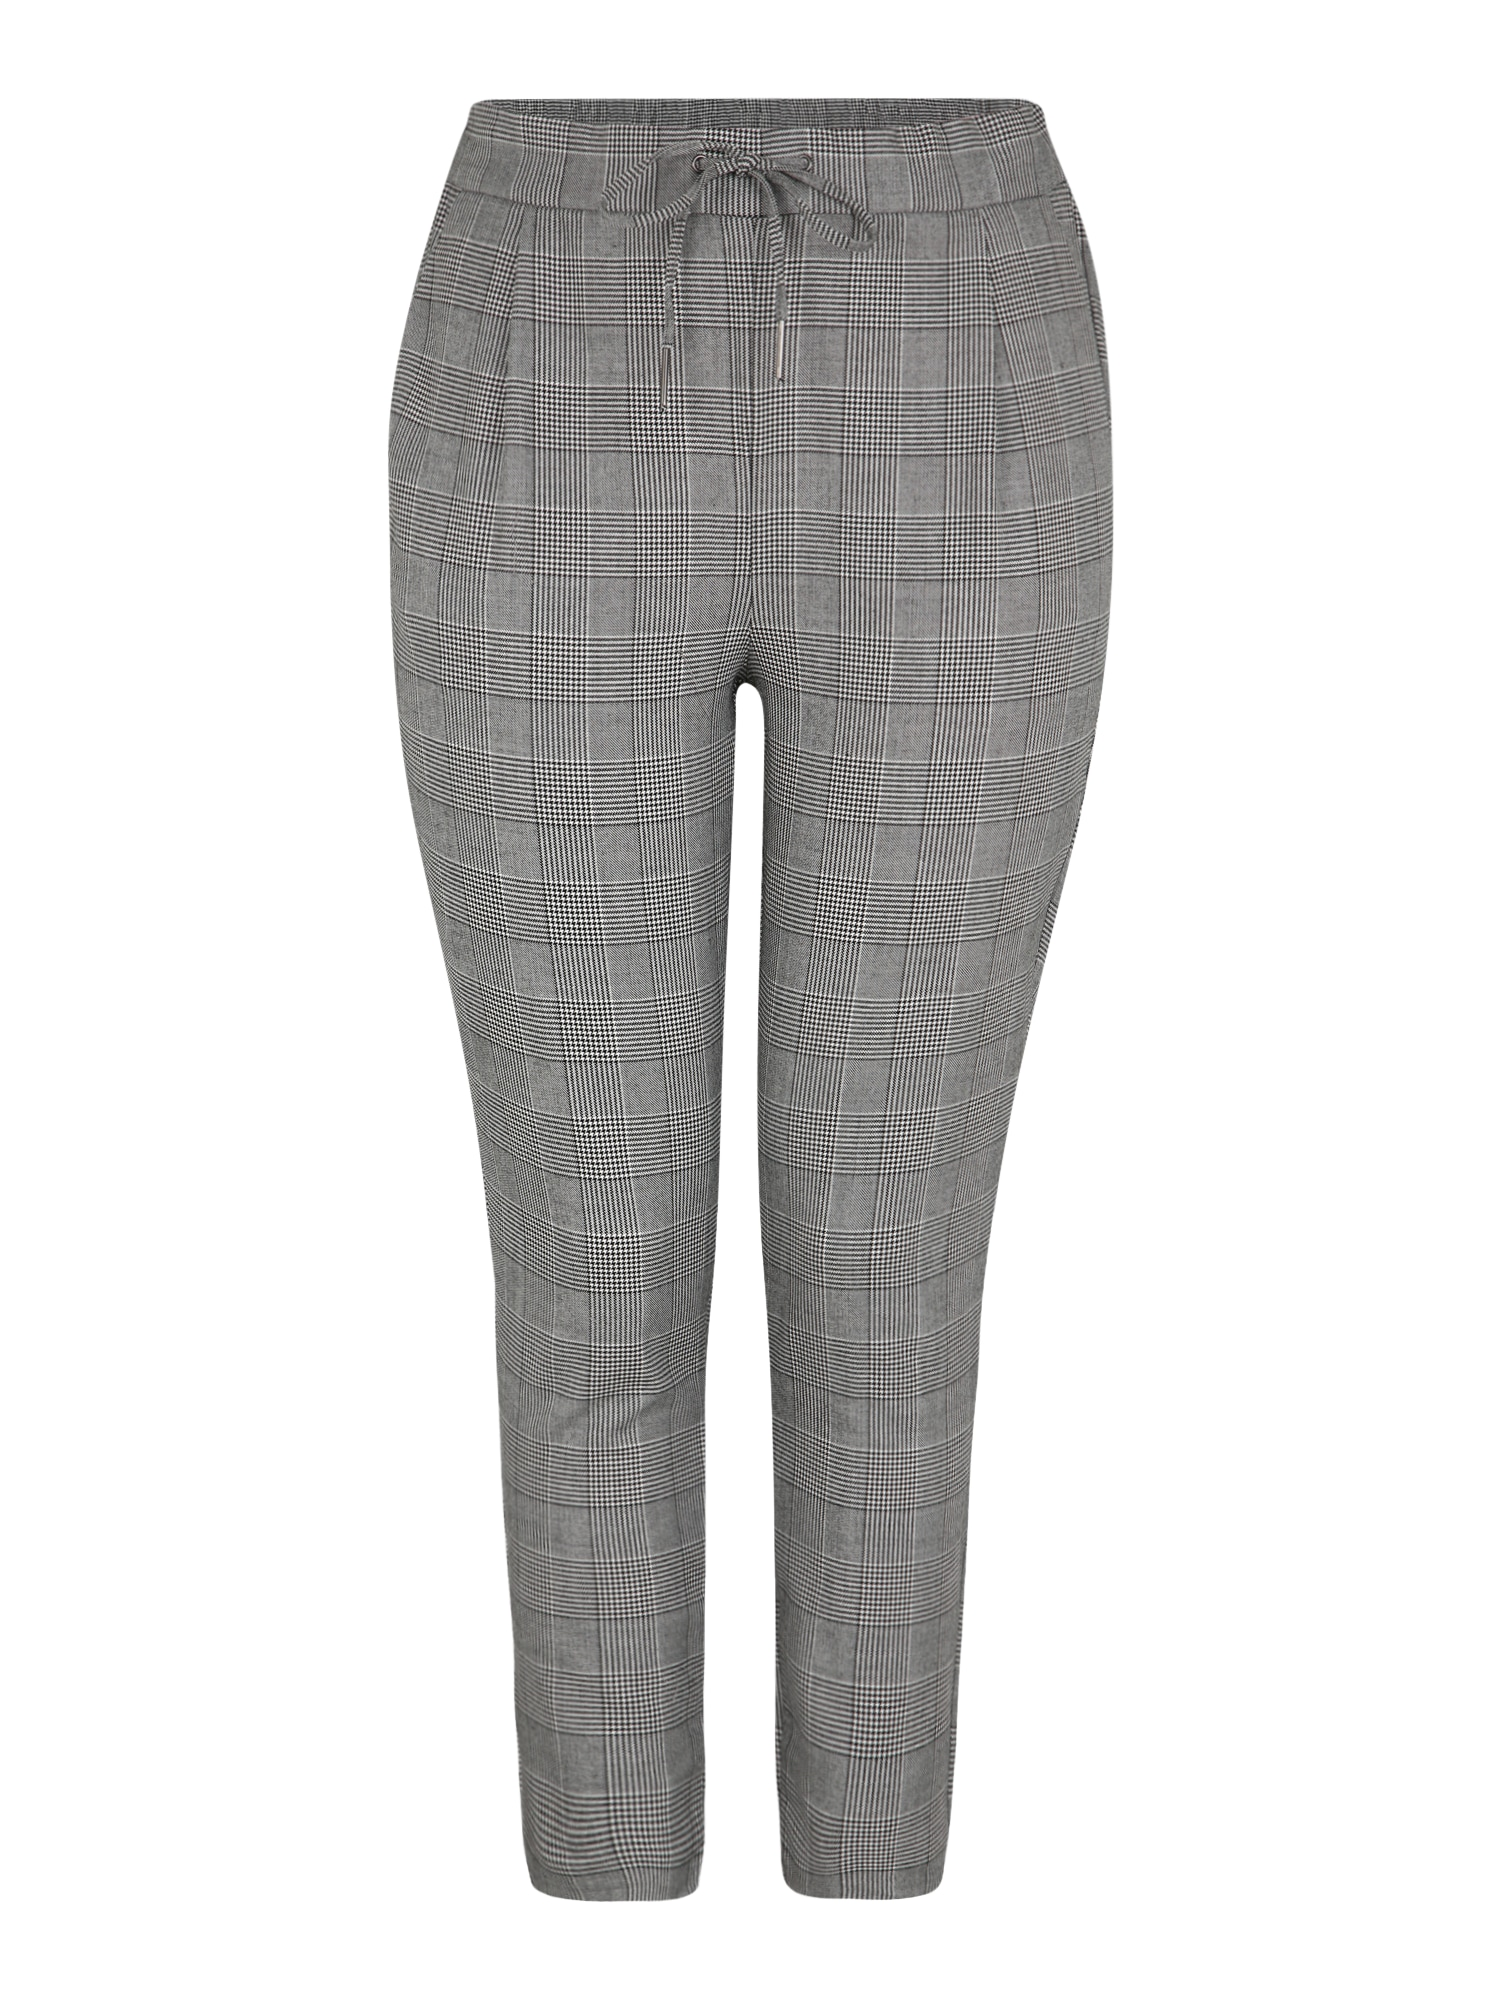 Hose 'EVA MR LOOSE STRING CHECKED PANT CURVE' | Unterwäsche & Reizwäsche > Strings | Grau - Weiß | Vero Moda Curve